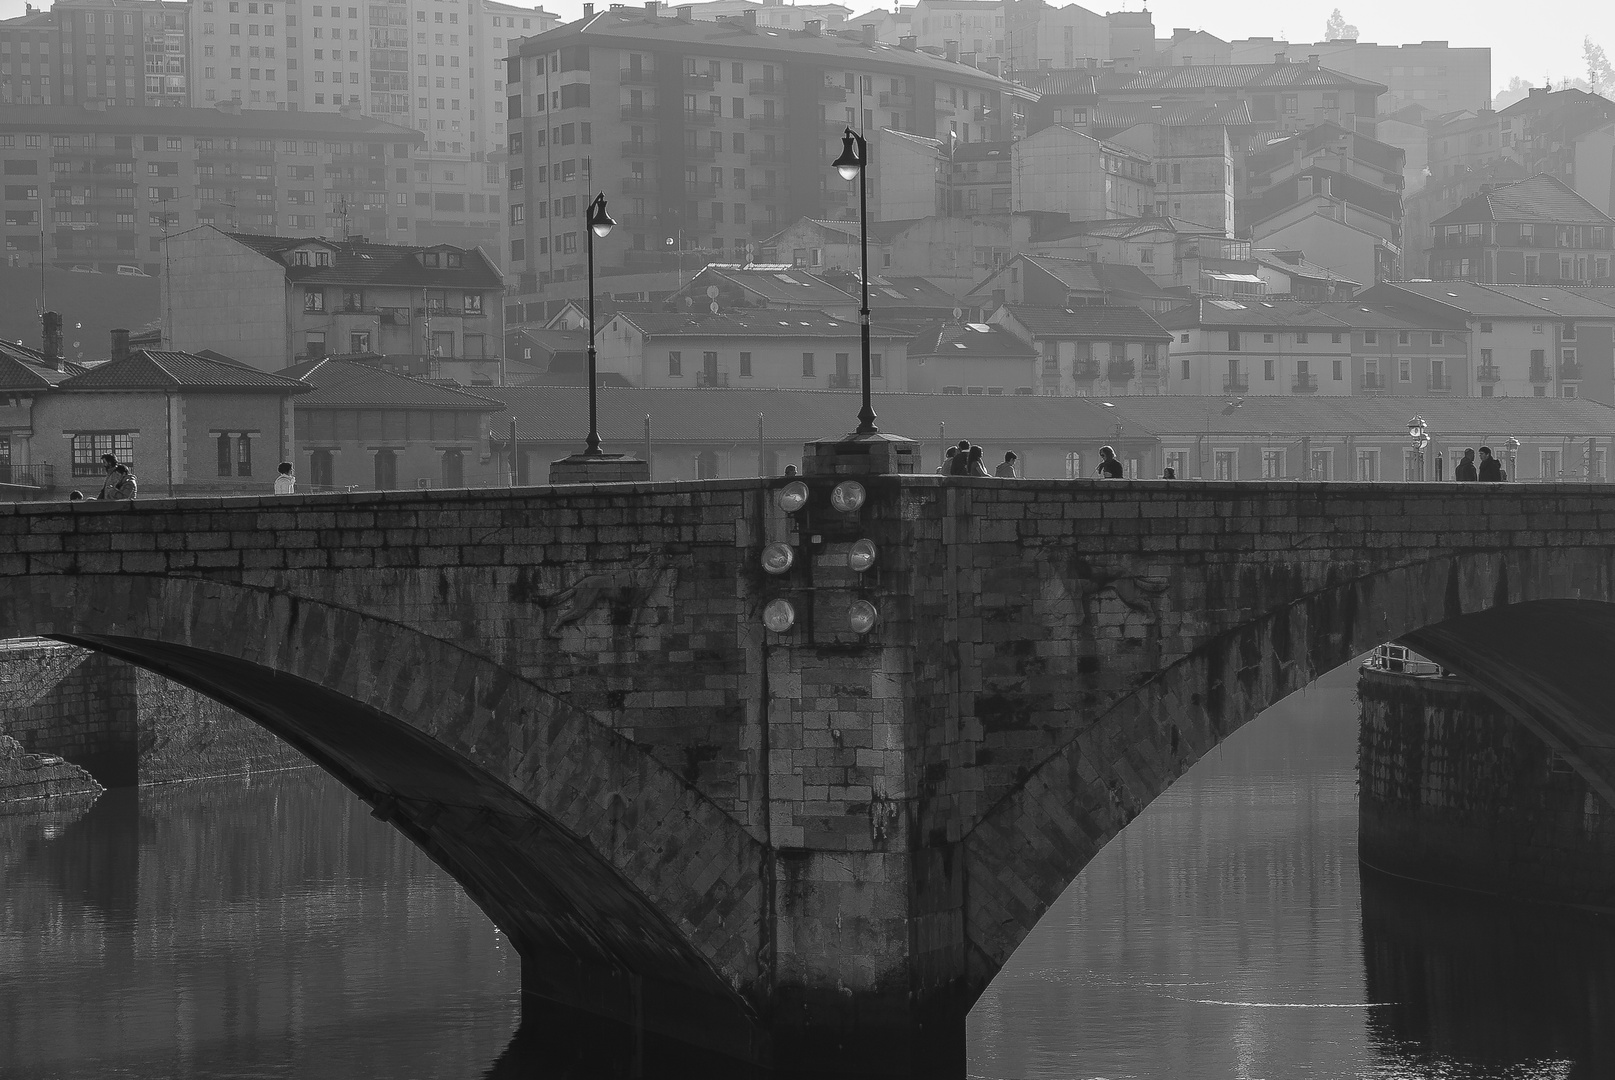 Winterstimmung in Bilbao